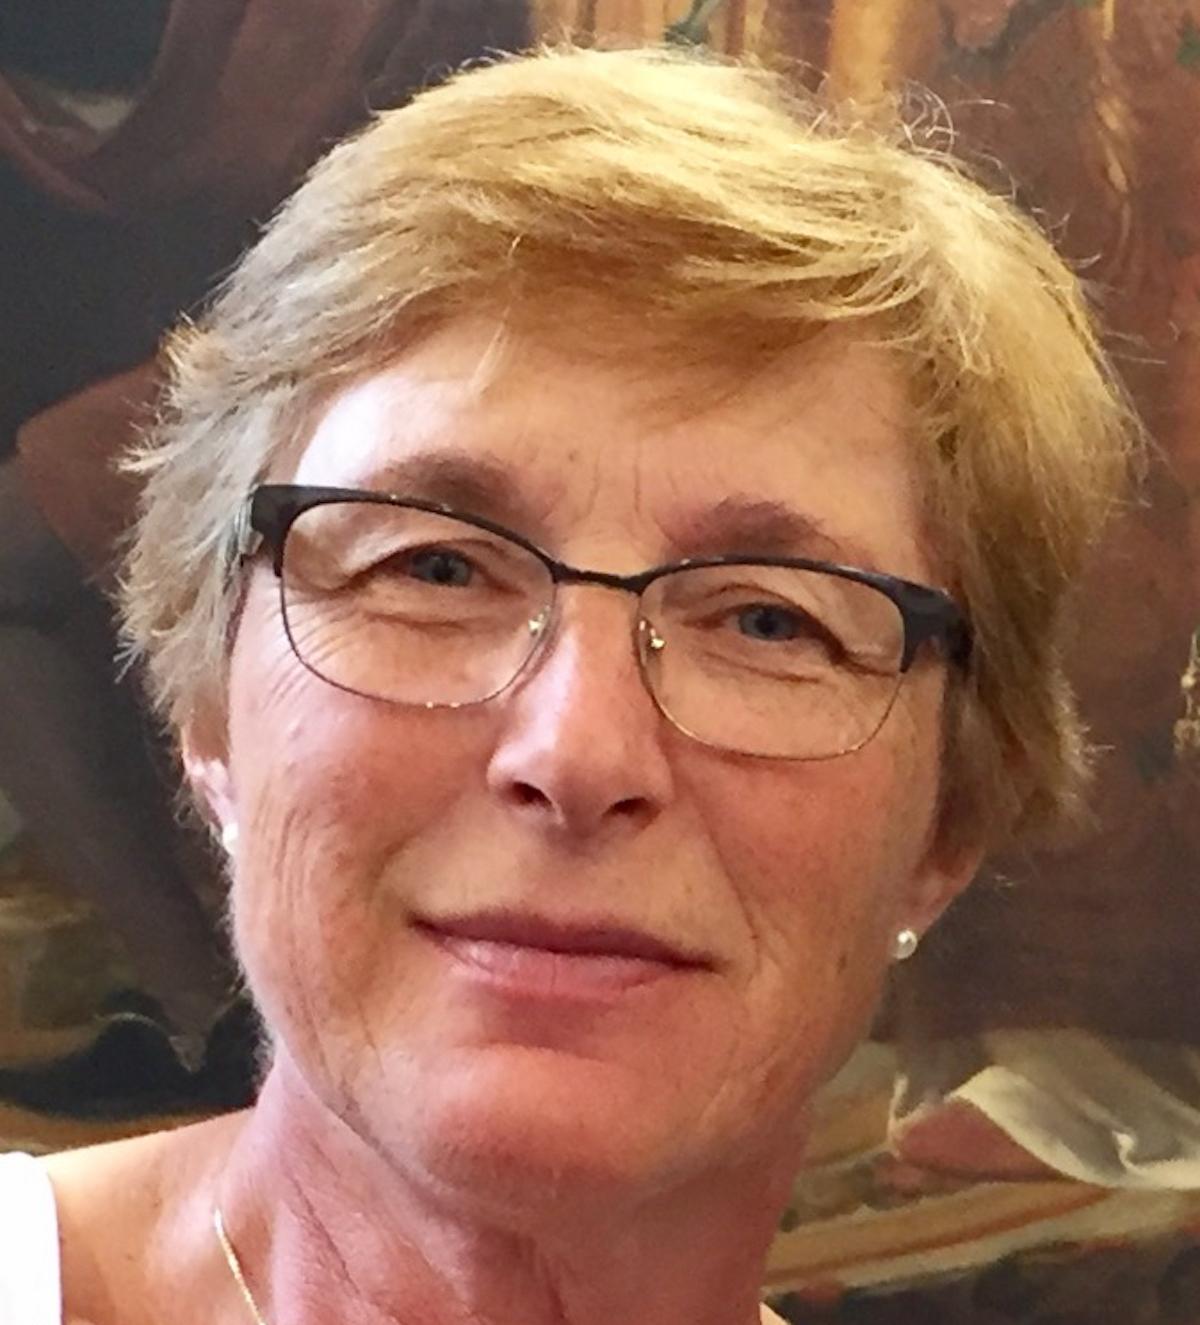 Swanica Ligtenberg